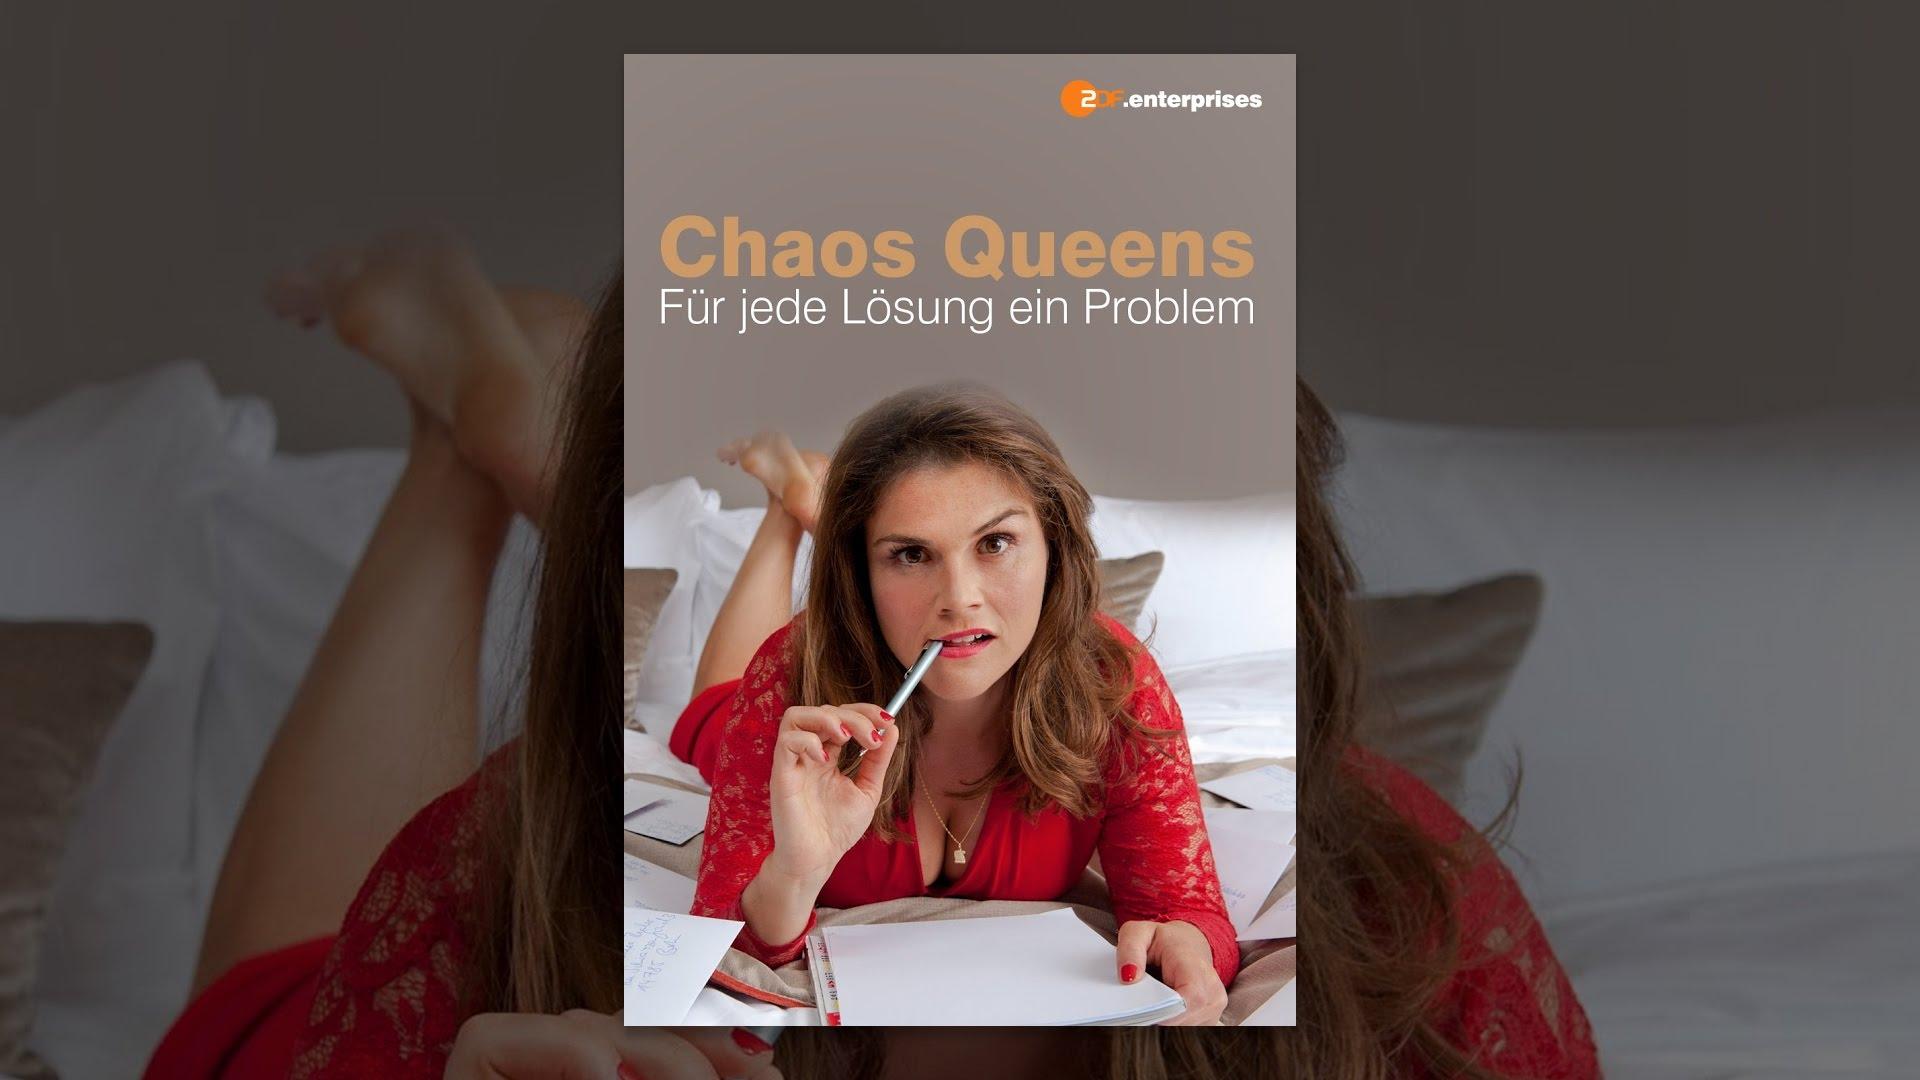 Chaosqueens